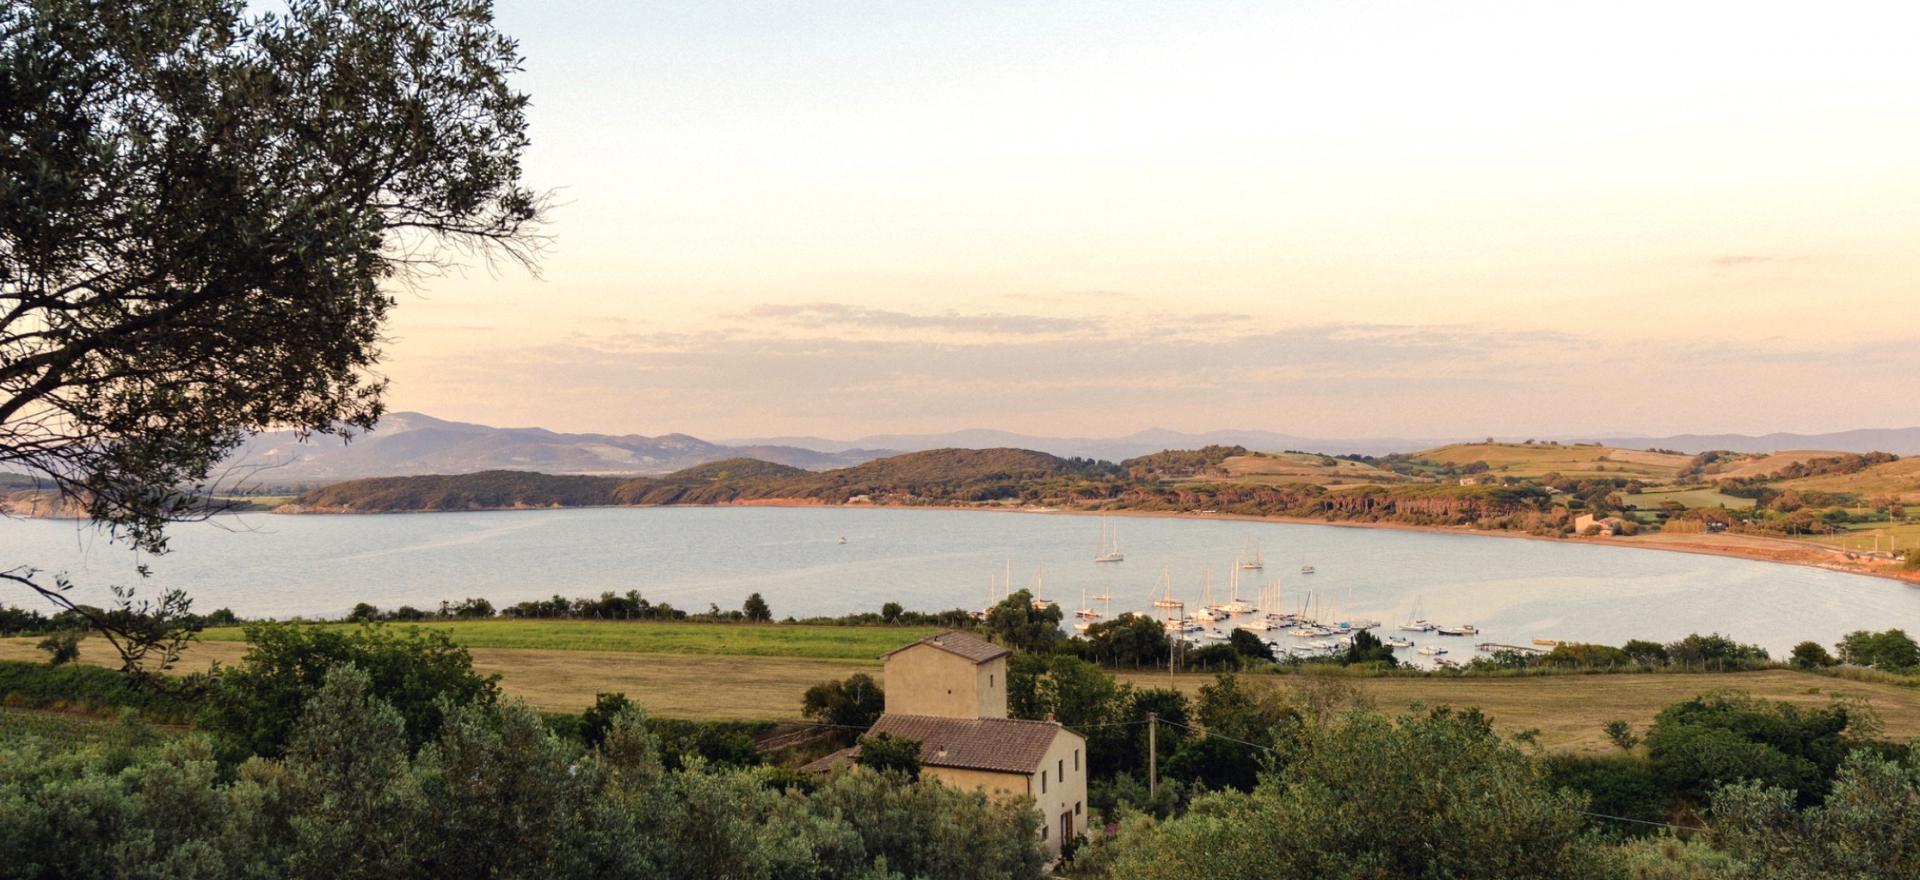 Agriturismo Toscana Agriturismo di lusso in Toscana con vista sul mare